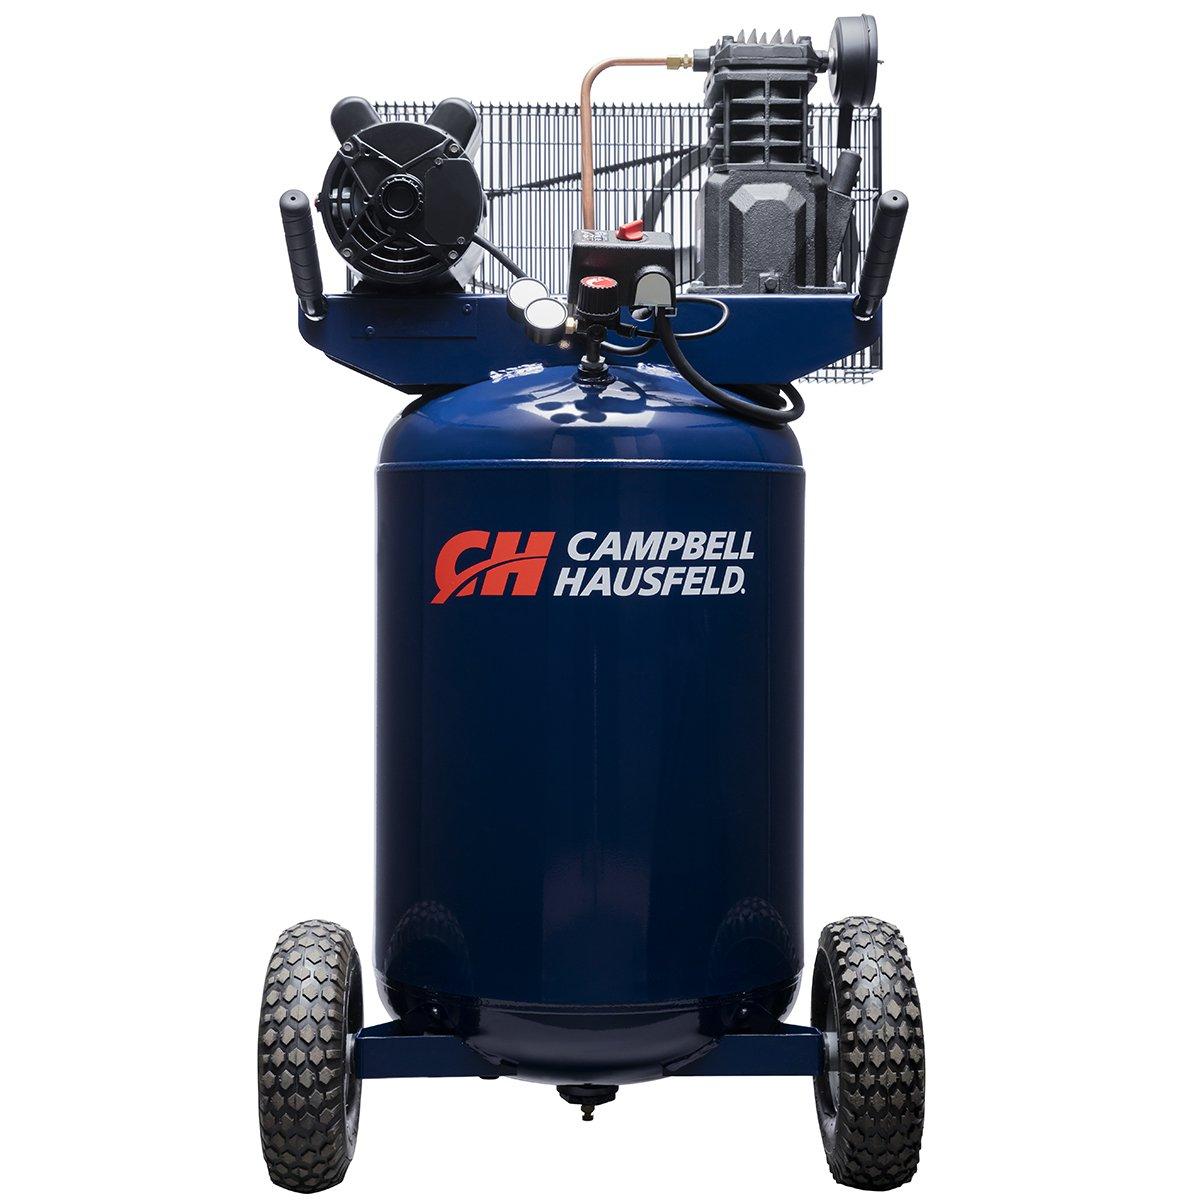 Vertical 30 Gallon Portable Air Compressor